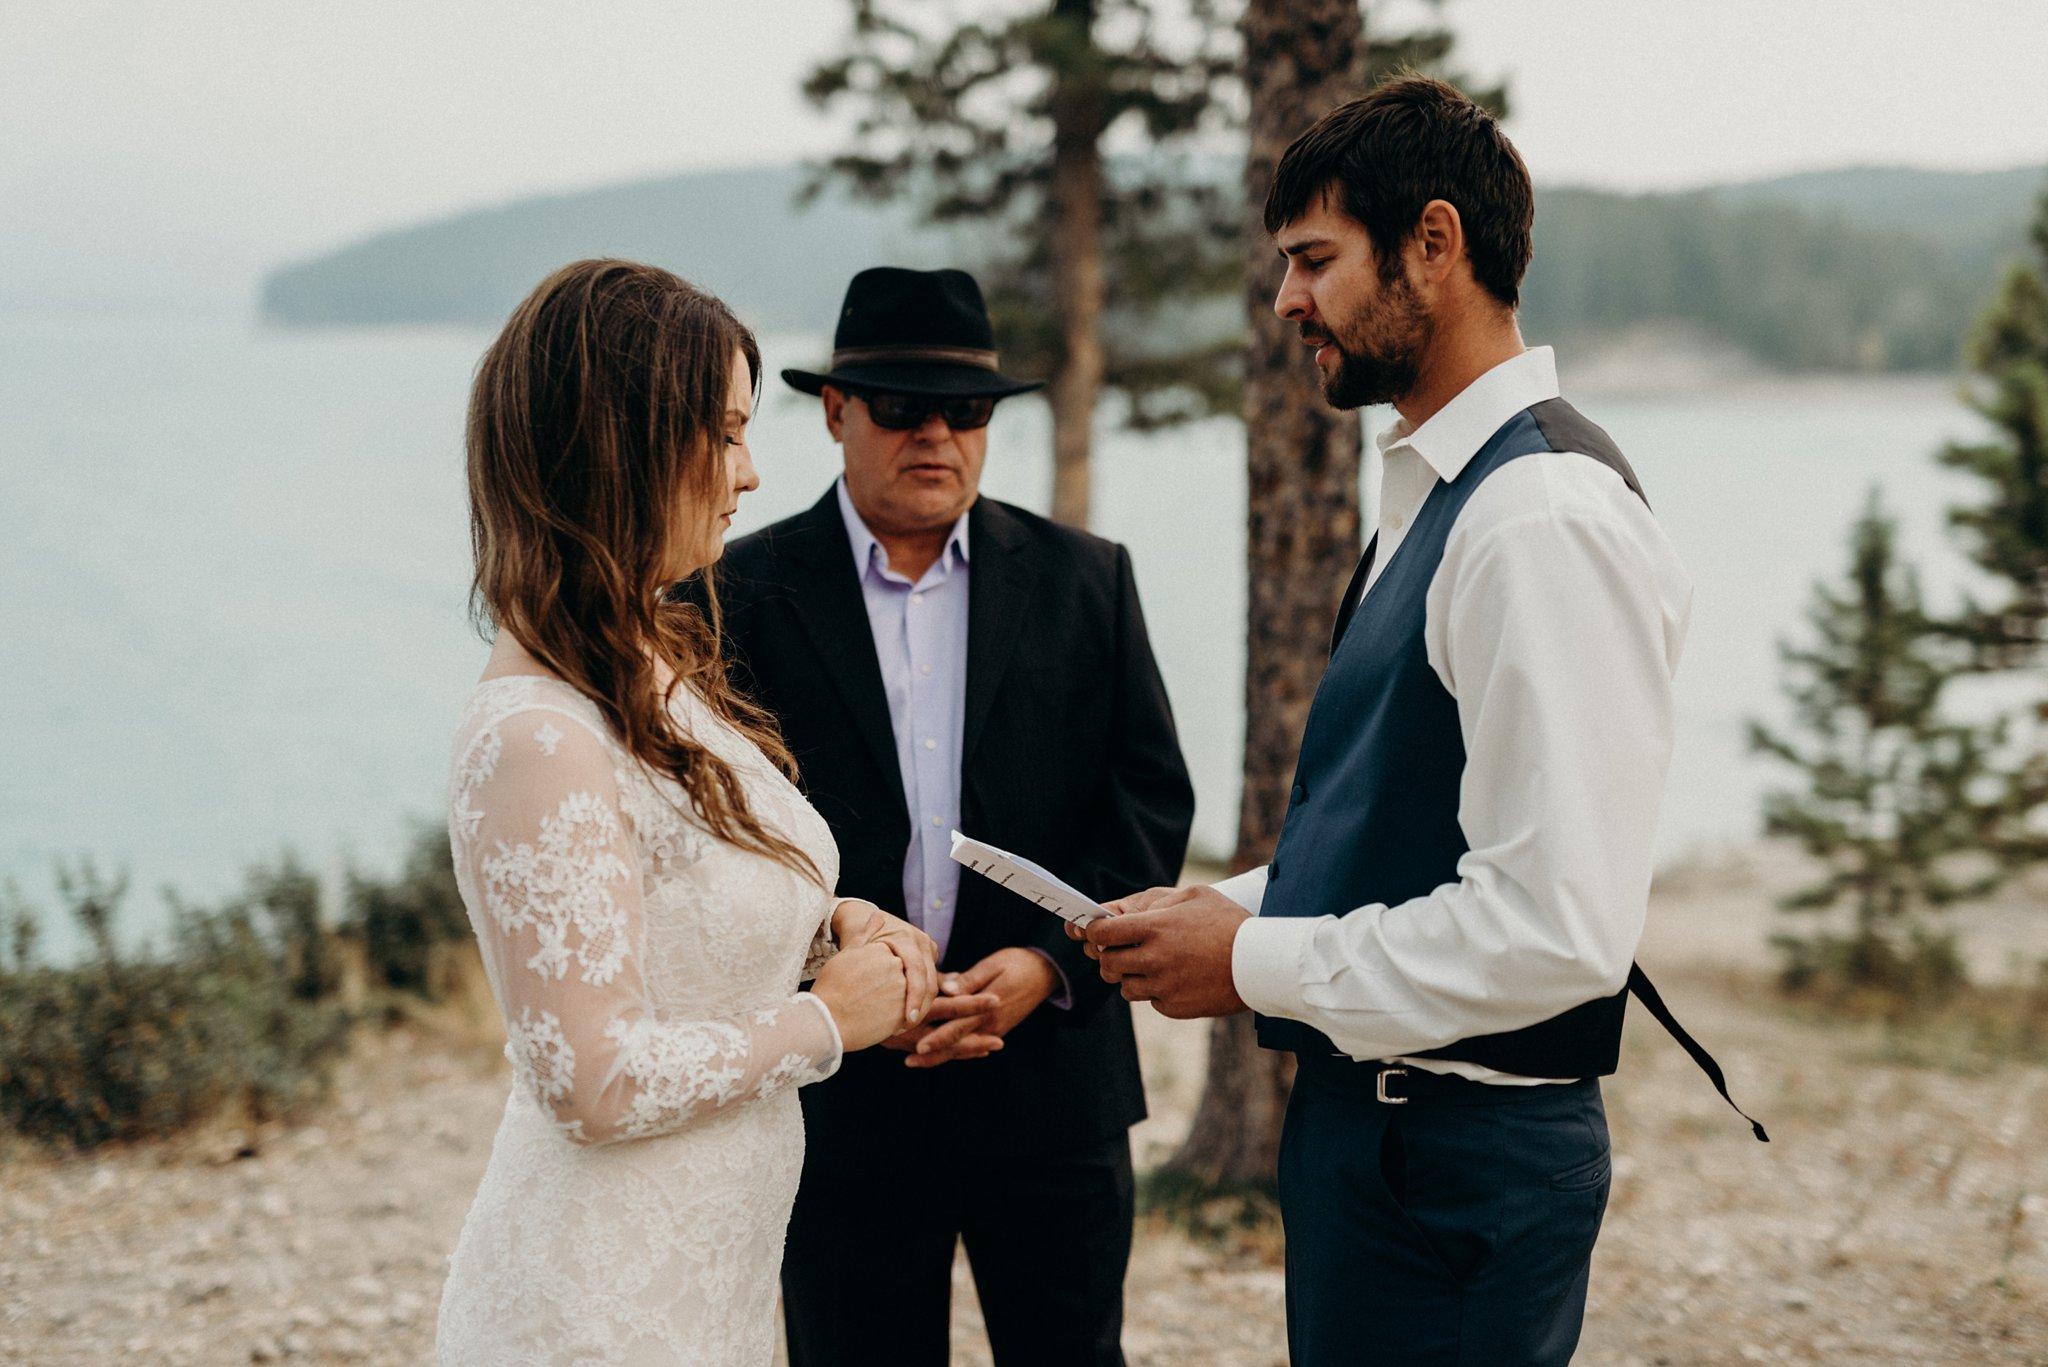 kaihla_tonai_intimate_wedding_elopement_photographer_6726.jpg